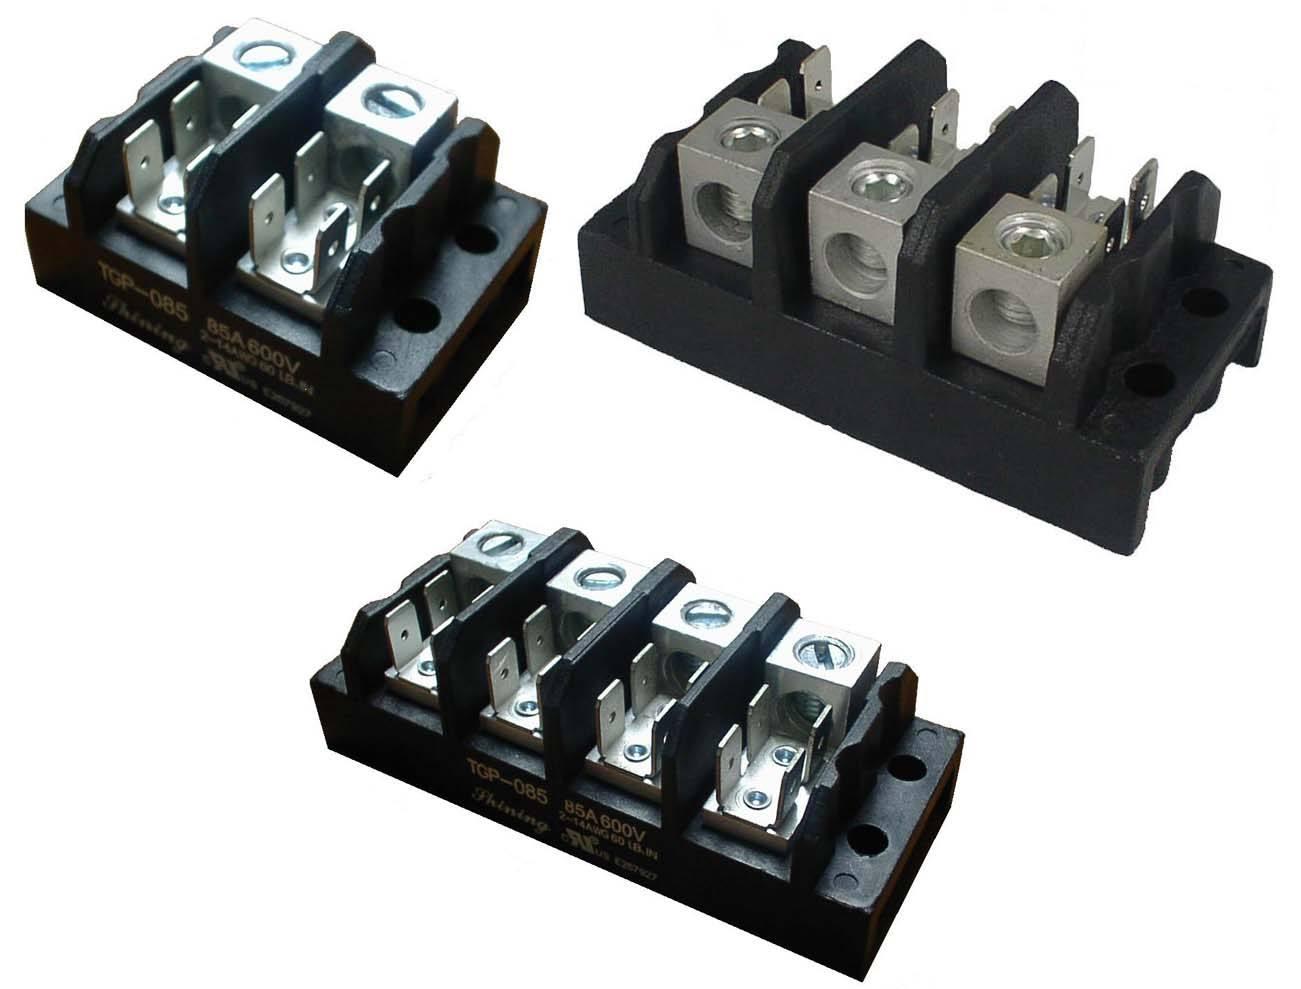 Power Terminal Block : Power terminal blocks taiwan high quality